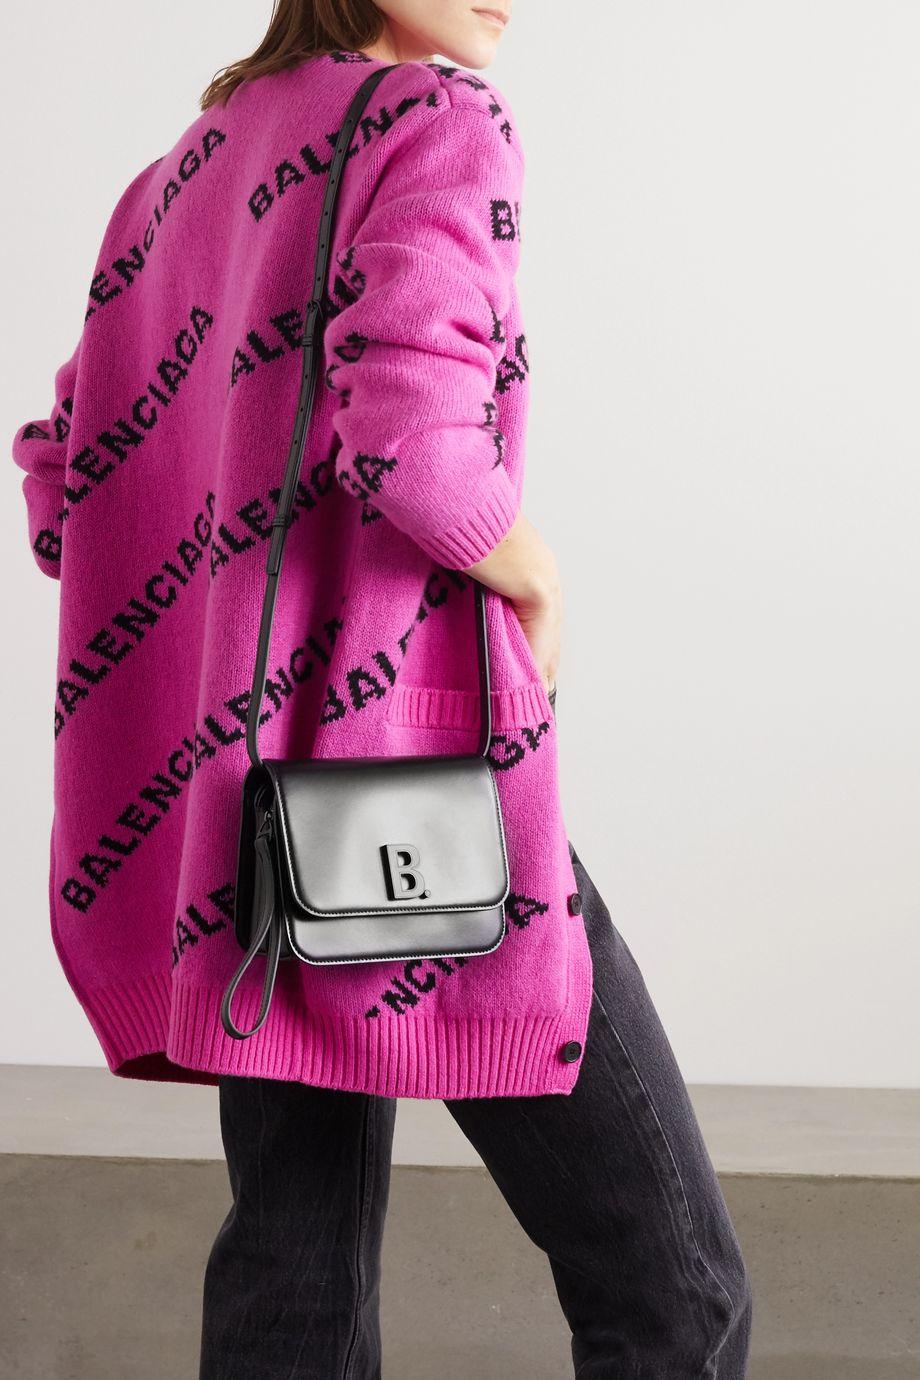 Balenciaga B Dot leather shoulder bag